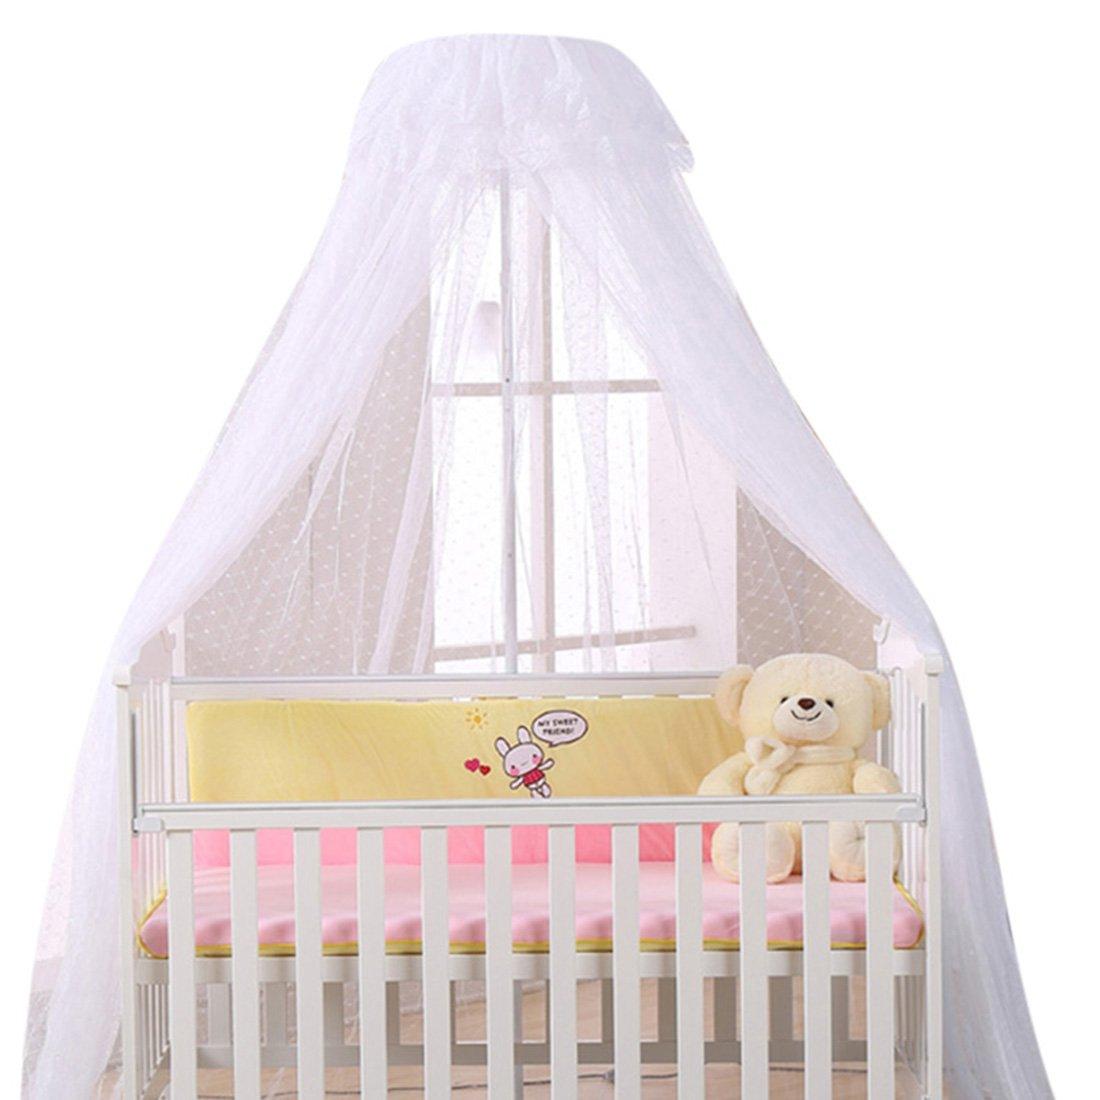 Tongda Mosquito Netting Keeps Away Insects Flies Baby Crib Netting